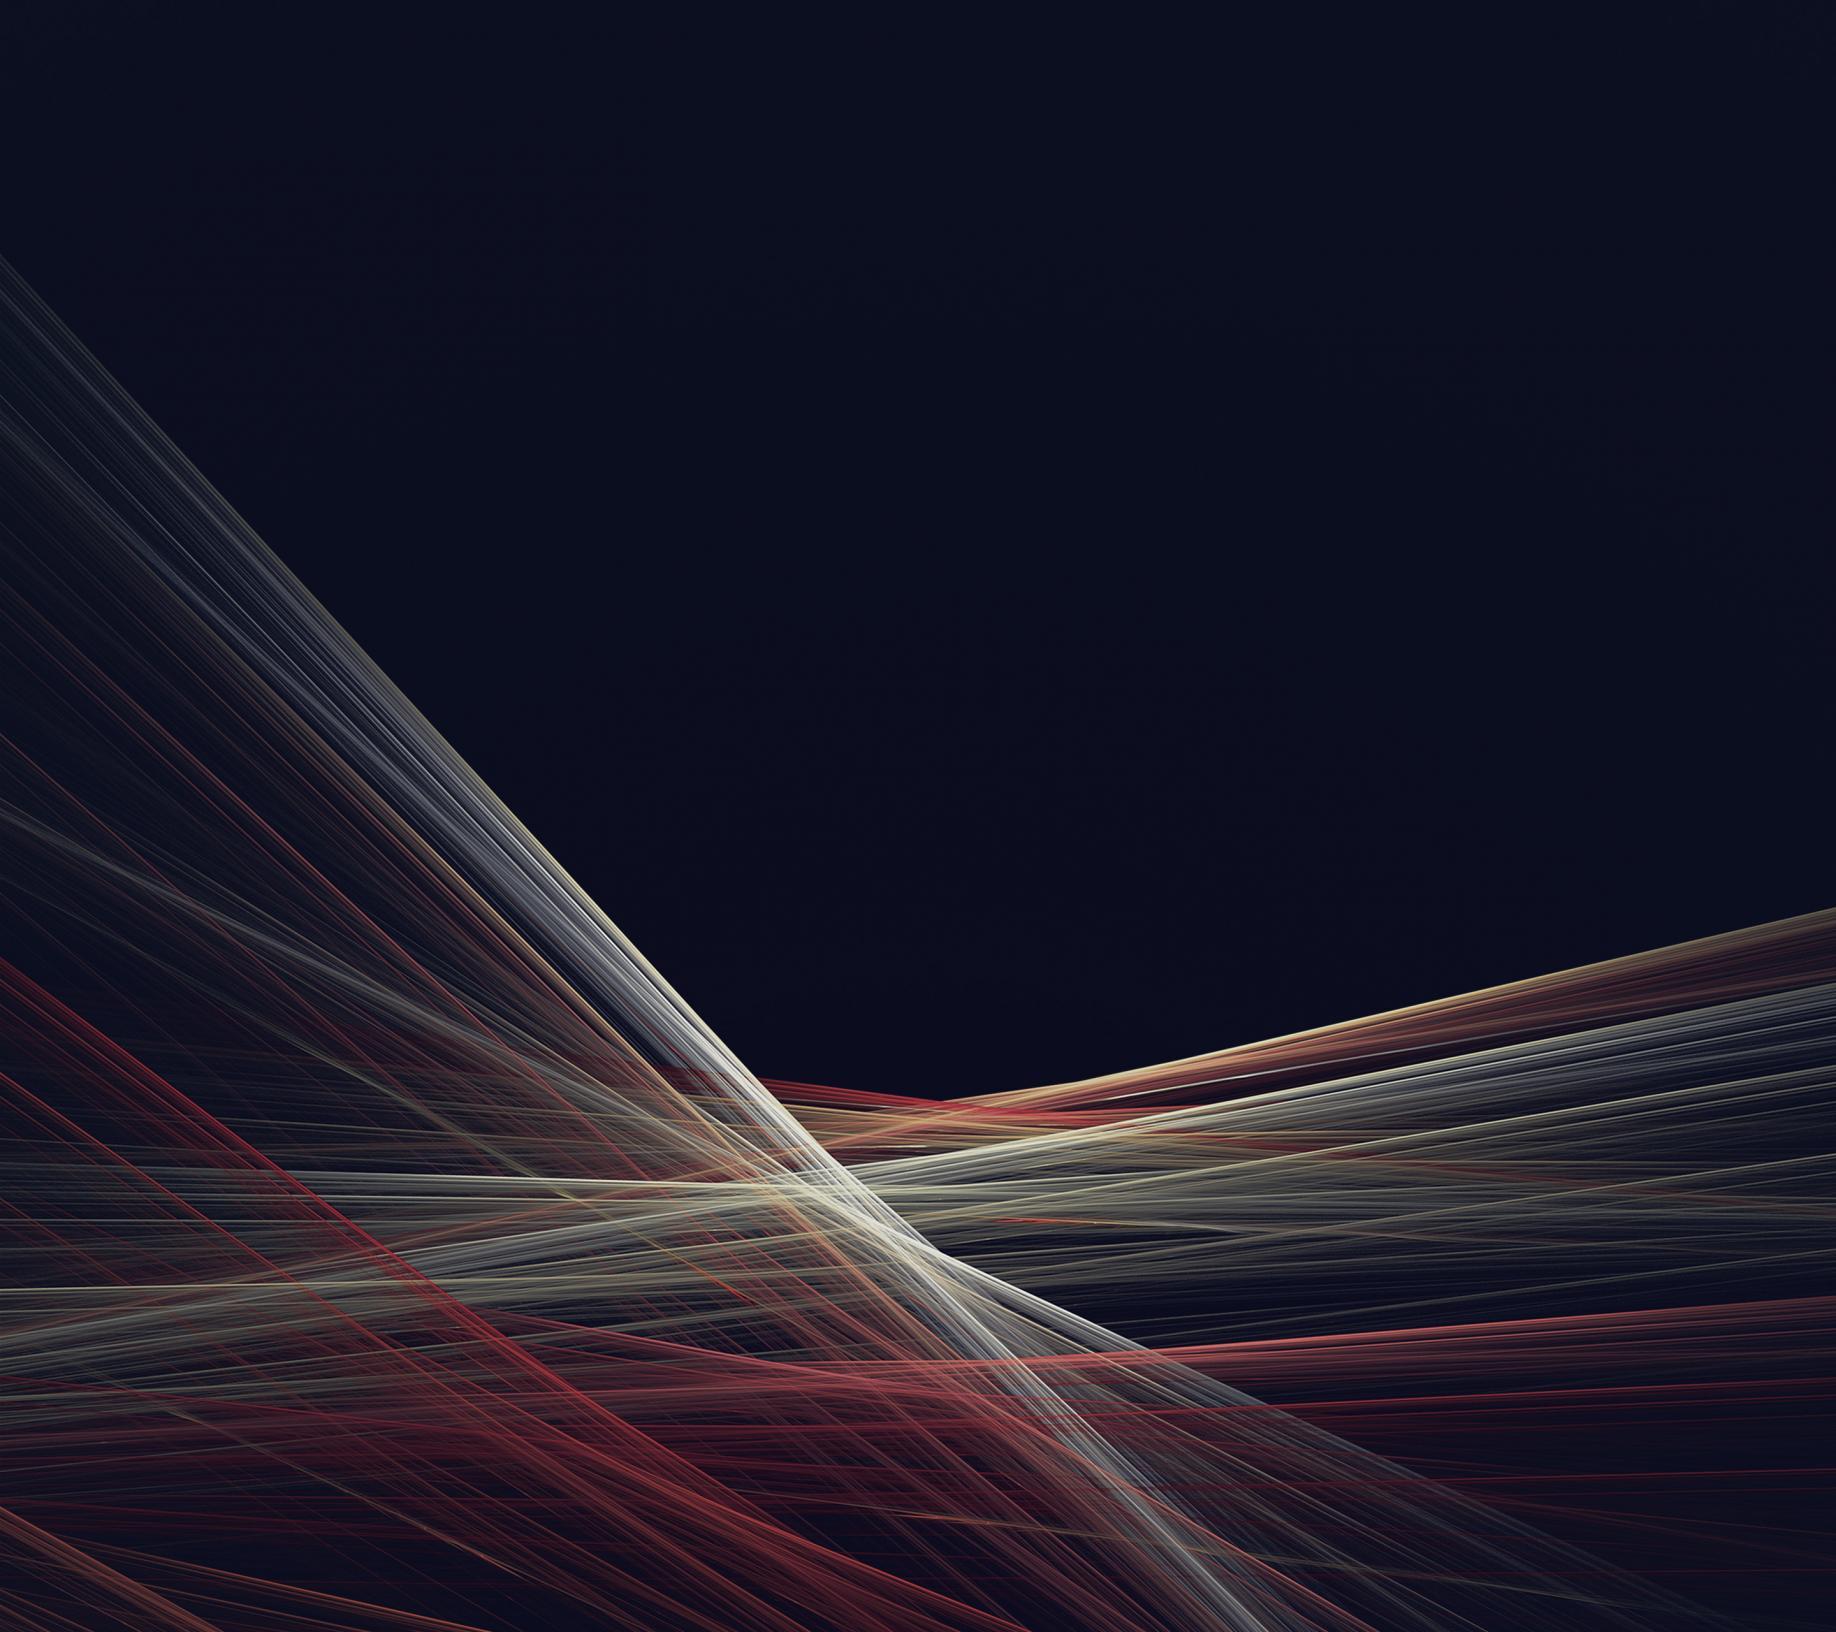 LG G3 Phone Wallpaper